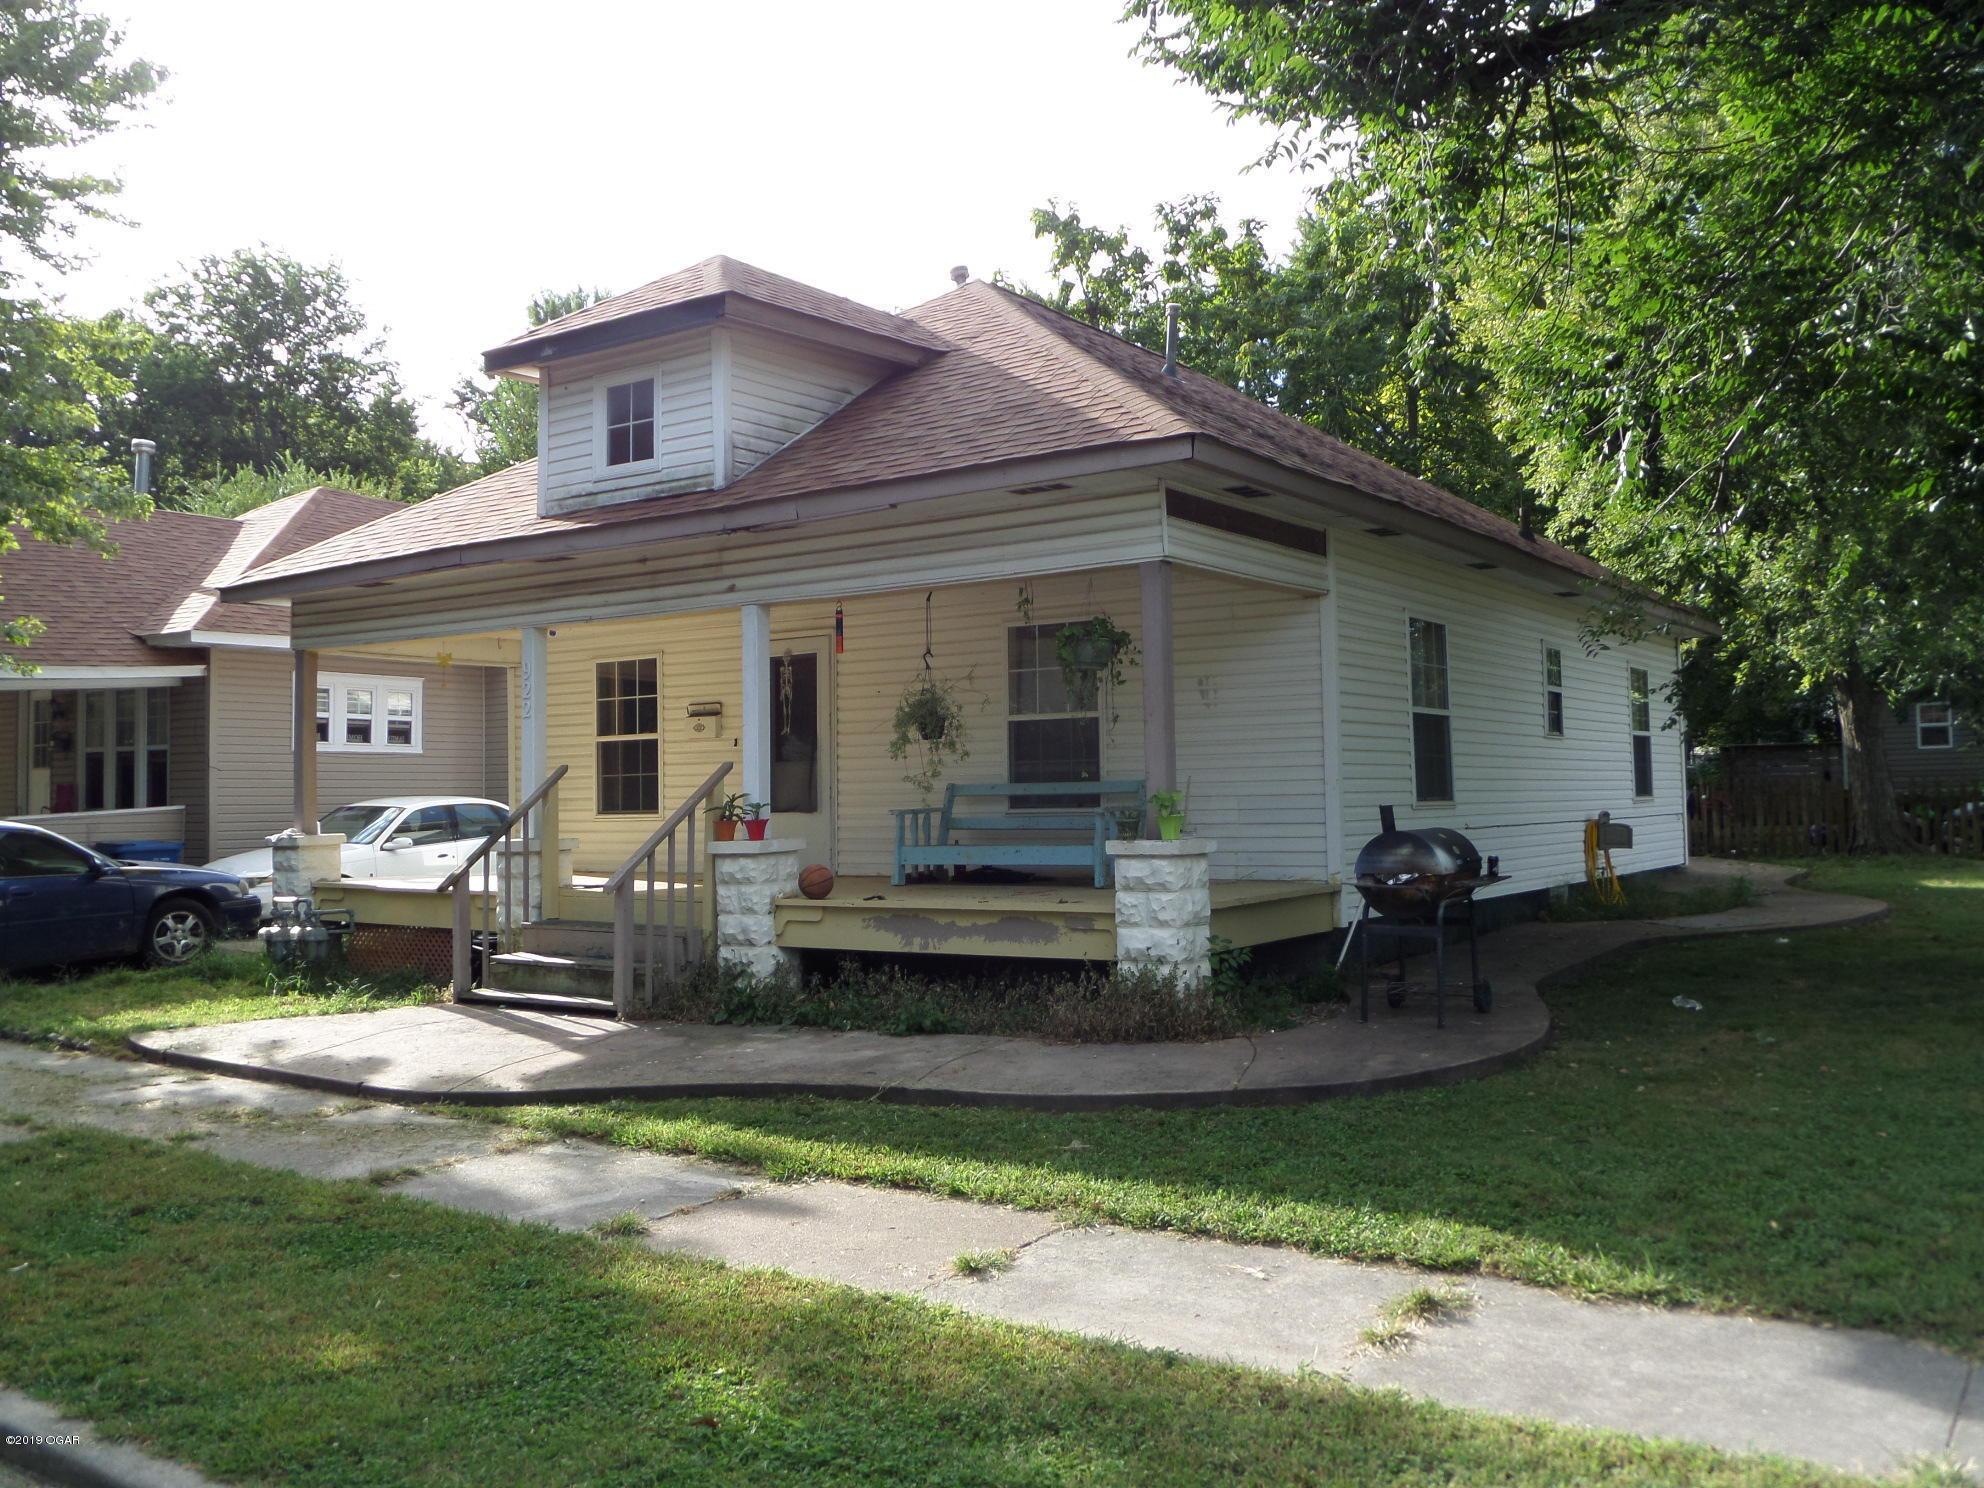 922 West 5th Street Joplin, MO 64801